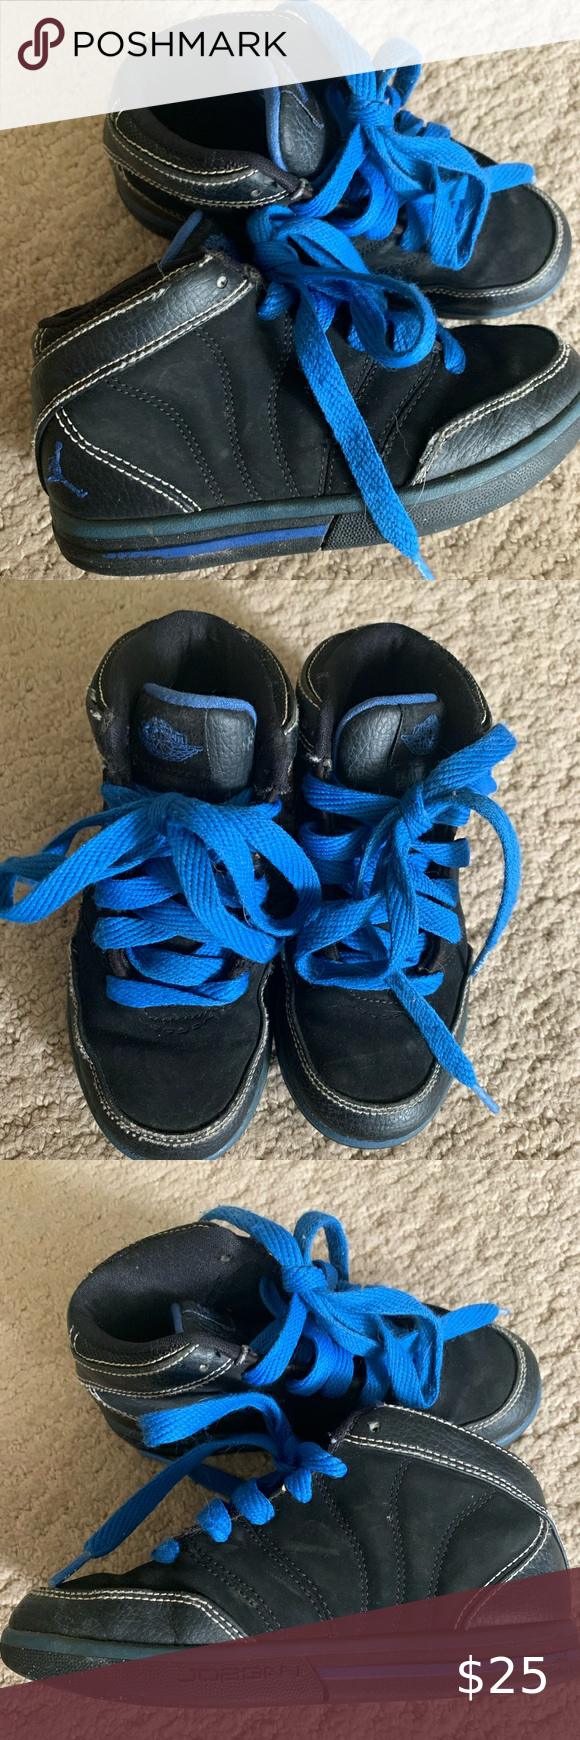 12c Jordan Shoes | Jordan shoes, Shoes, Jordans